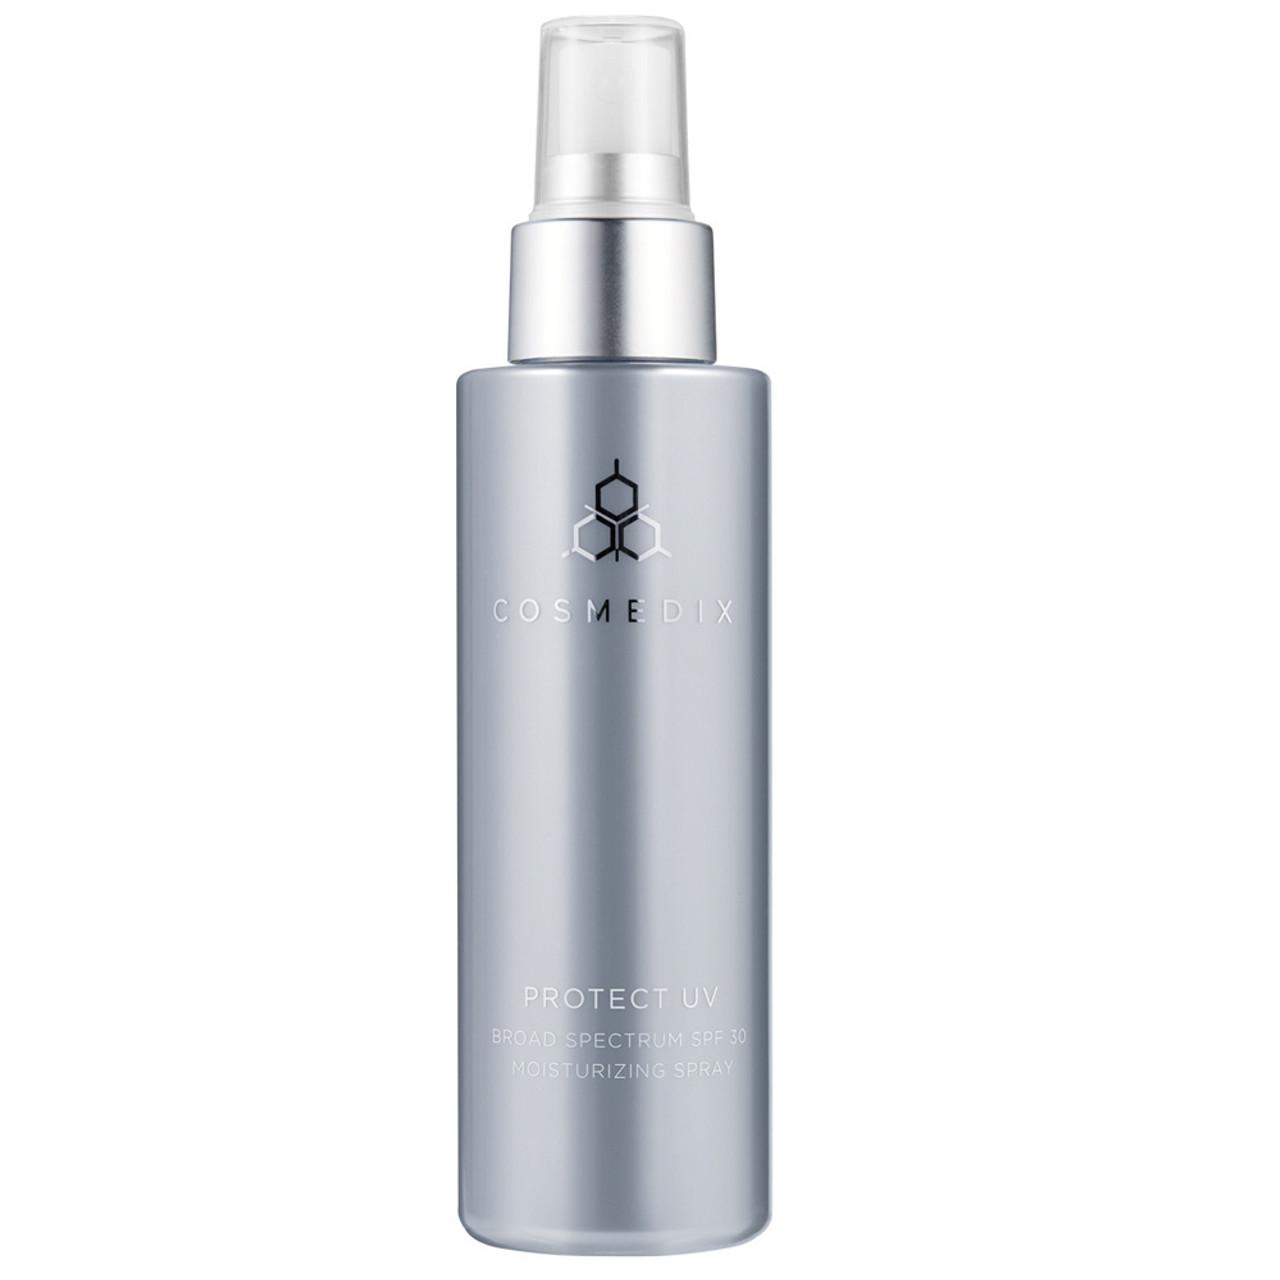 CosMedix Protect UV SPF 30 Moisturizing Spray